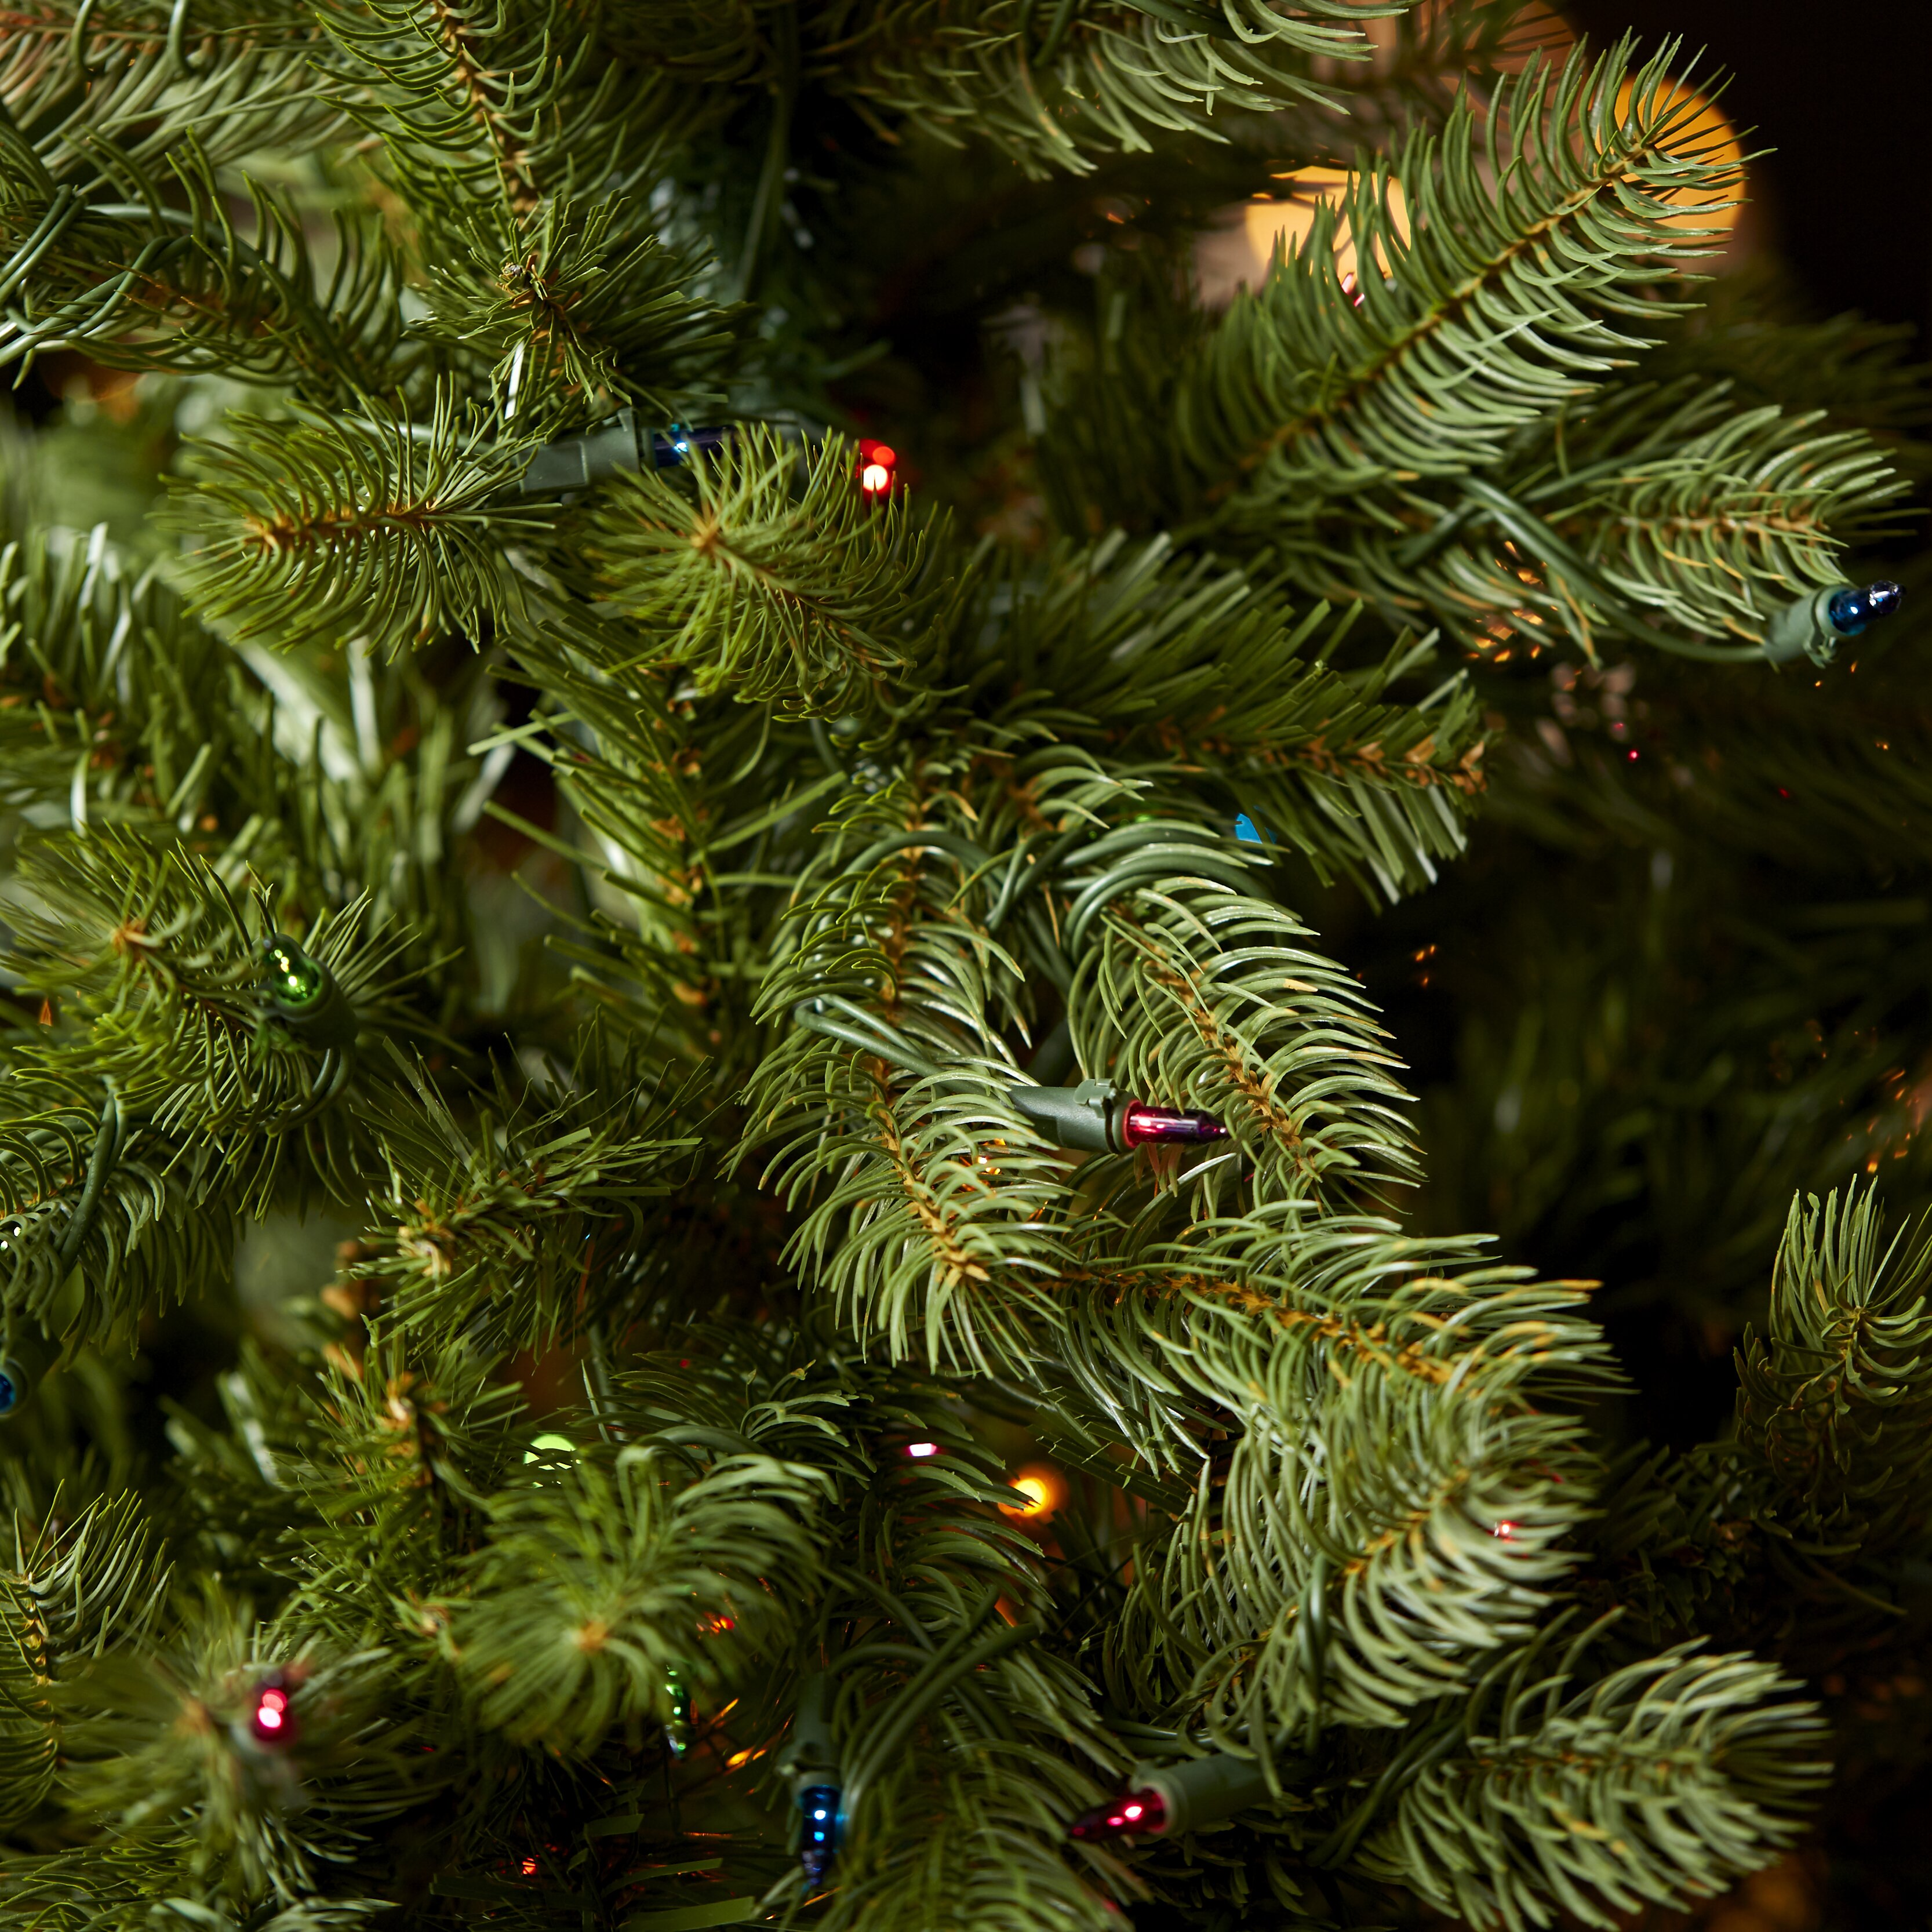 Douglas Fir Artificial Christmas Trees: National Tree Co. Douglas Fir Downswept 4.5' Green